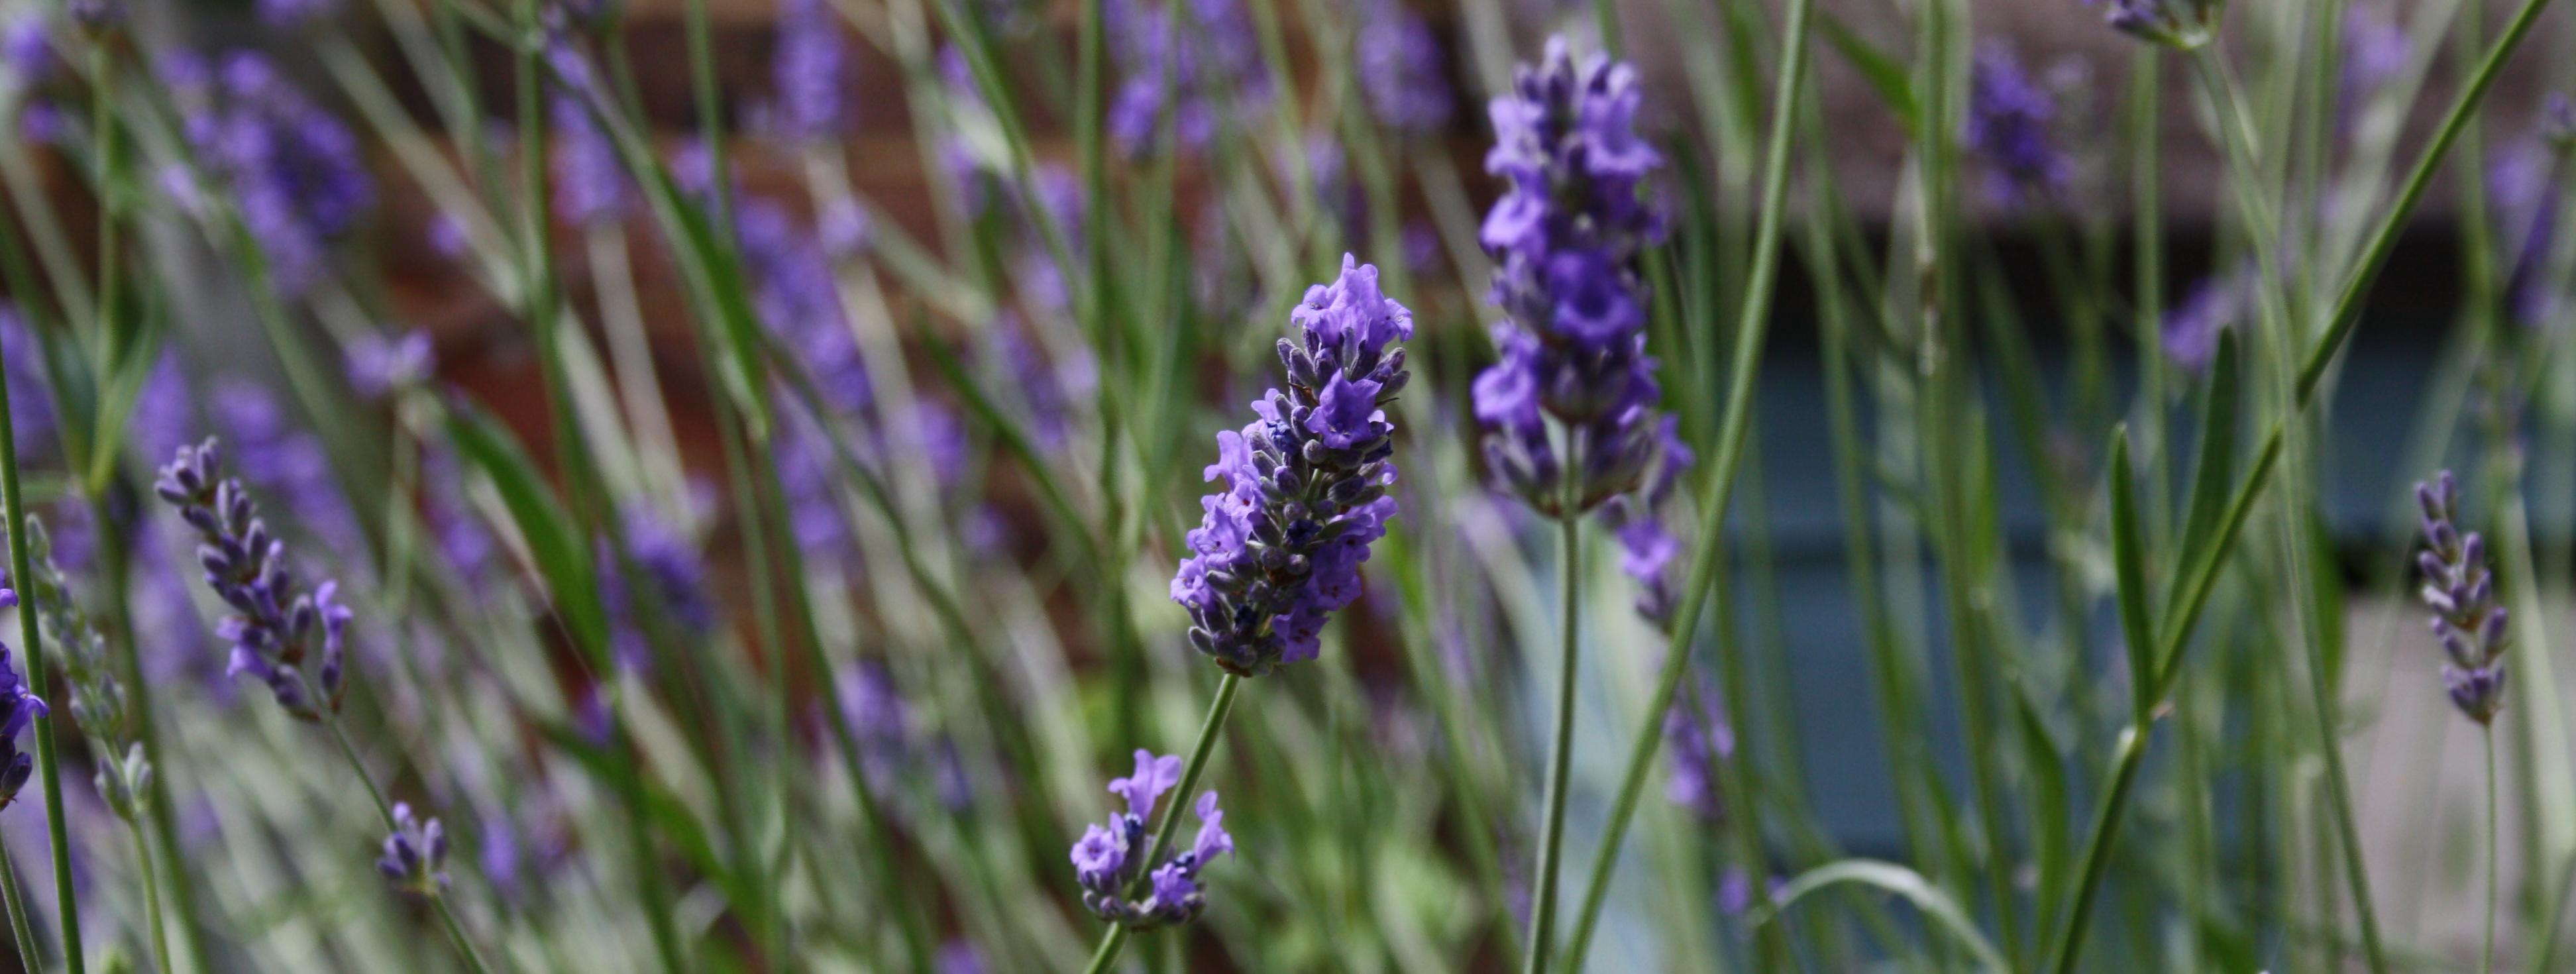 lavender_cropped.jpg